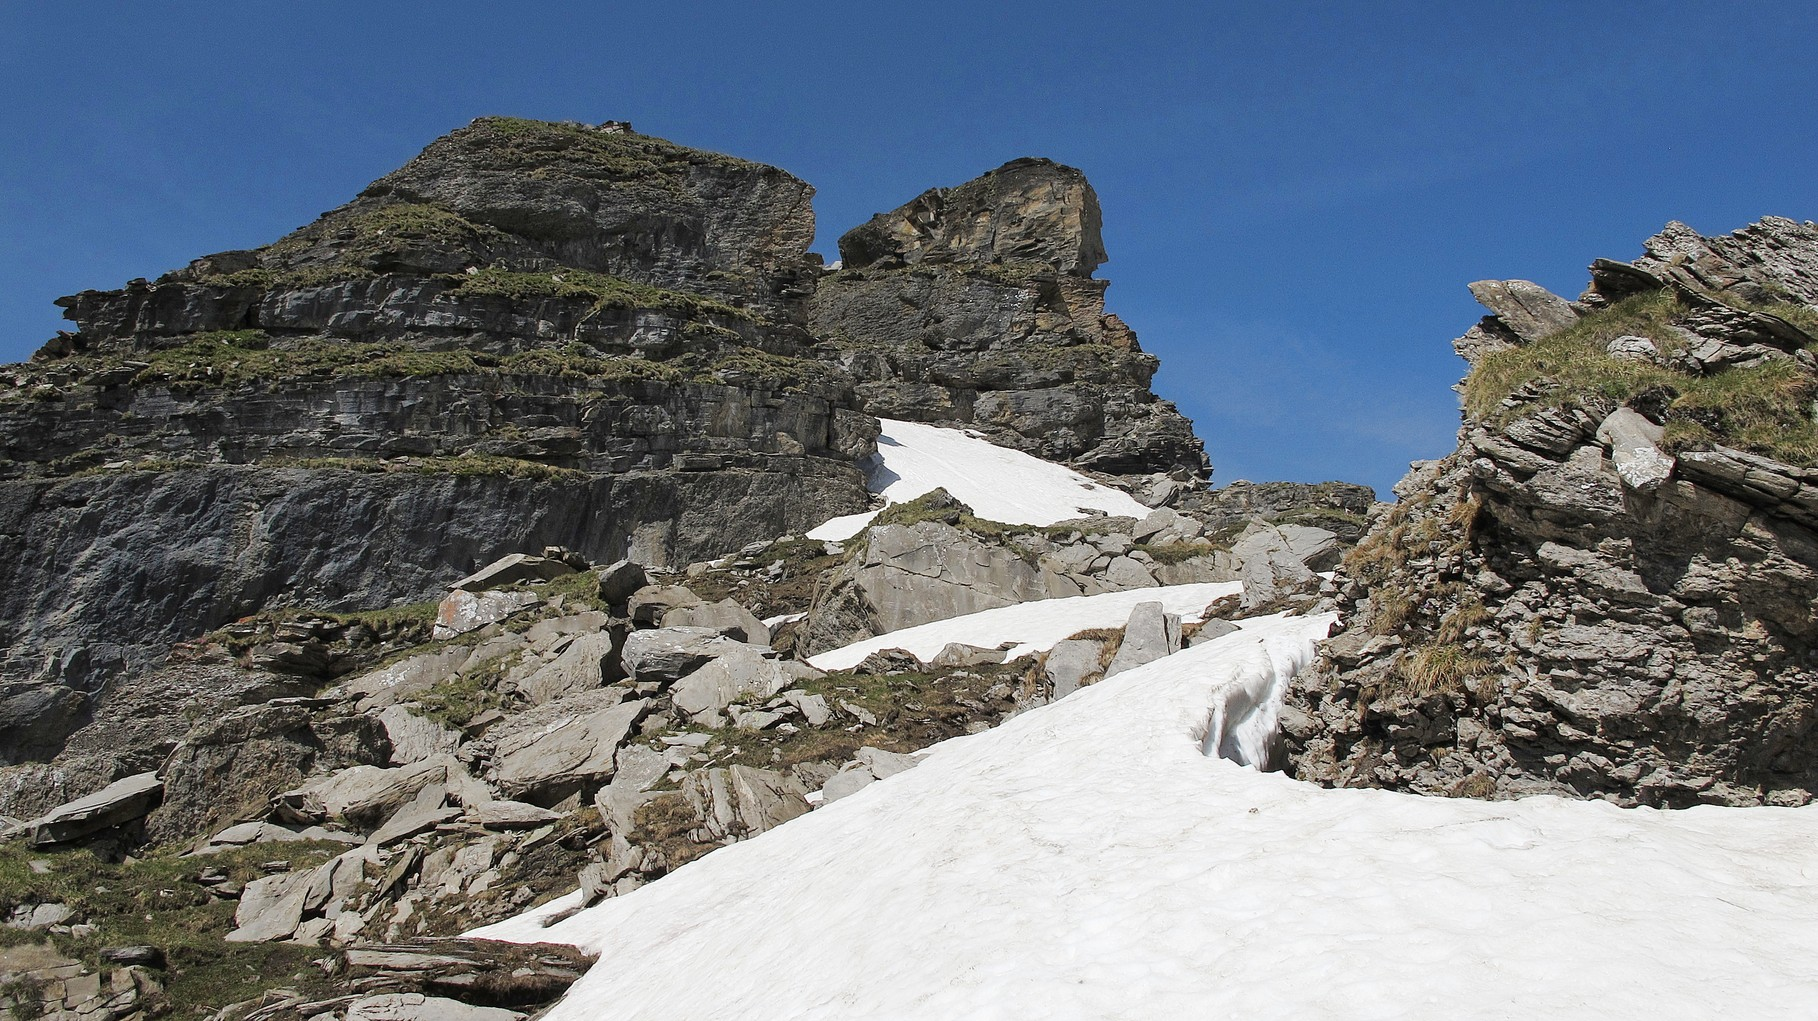 rechts der Gipfel